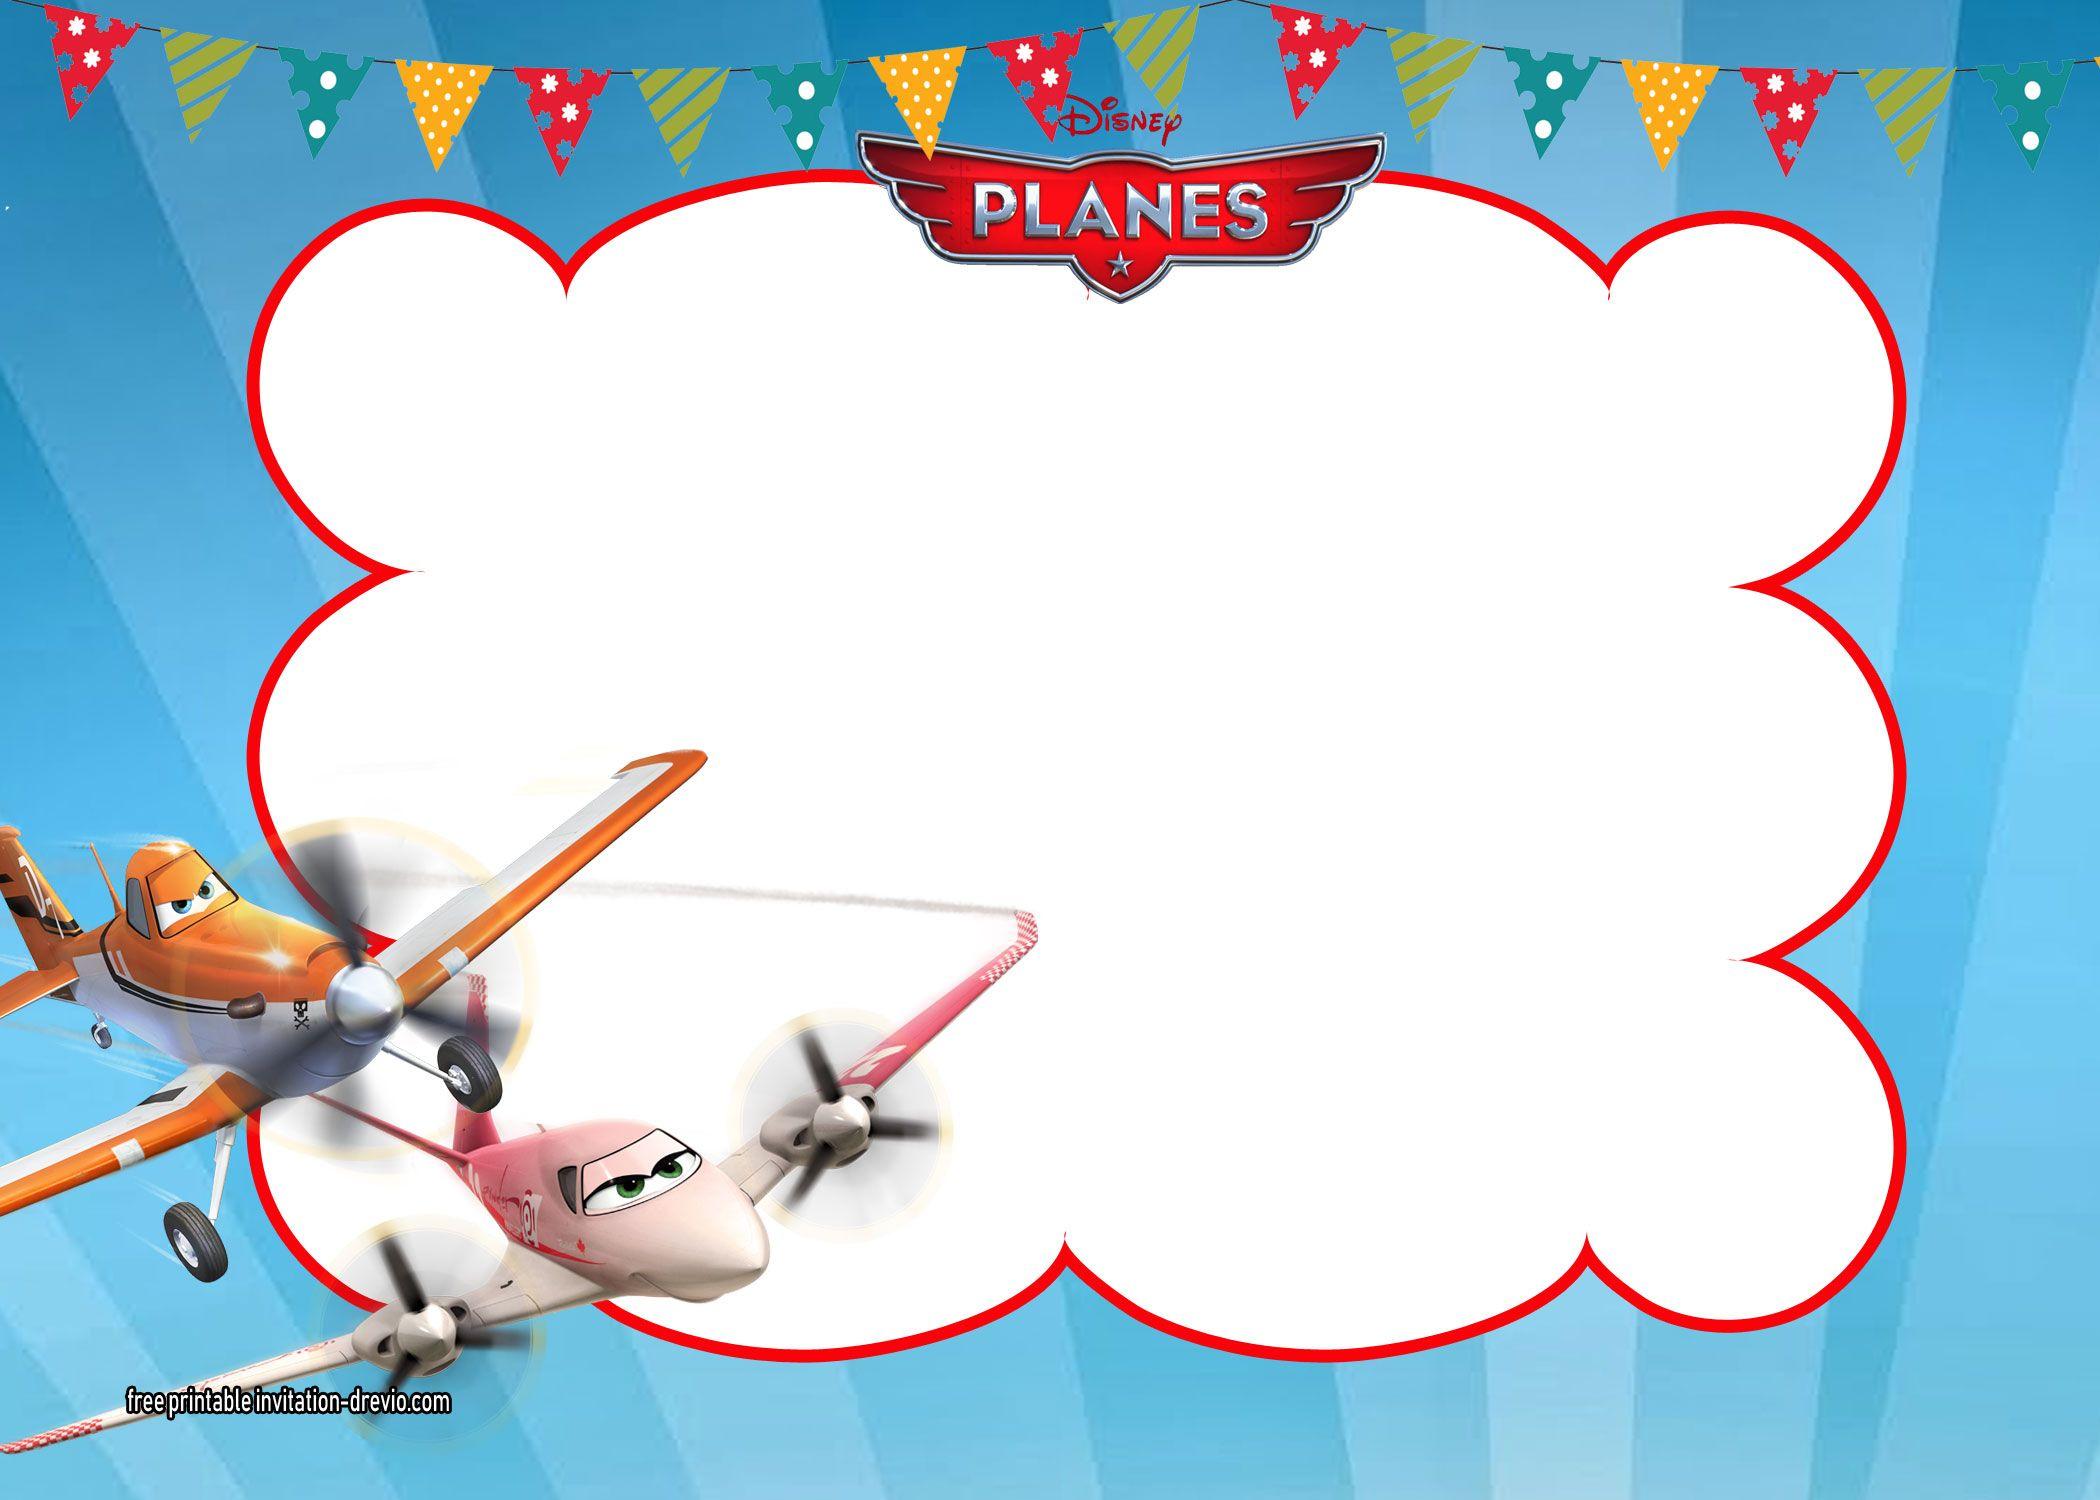 Disney Planes Invitations Templates   Free Printable Birthday ...